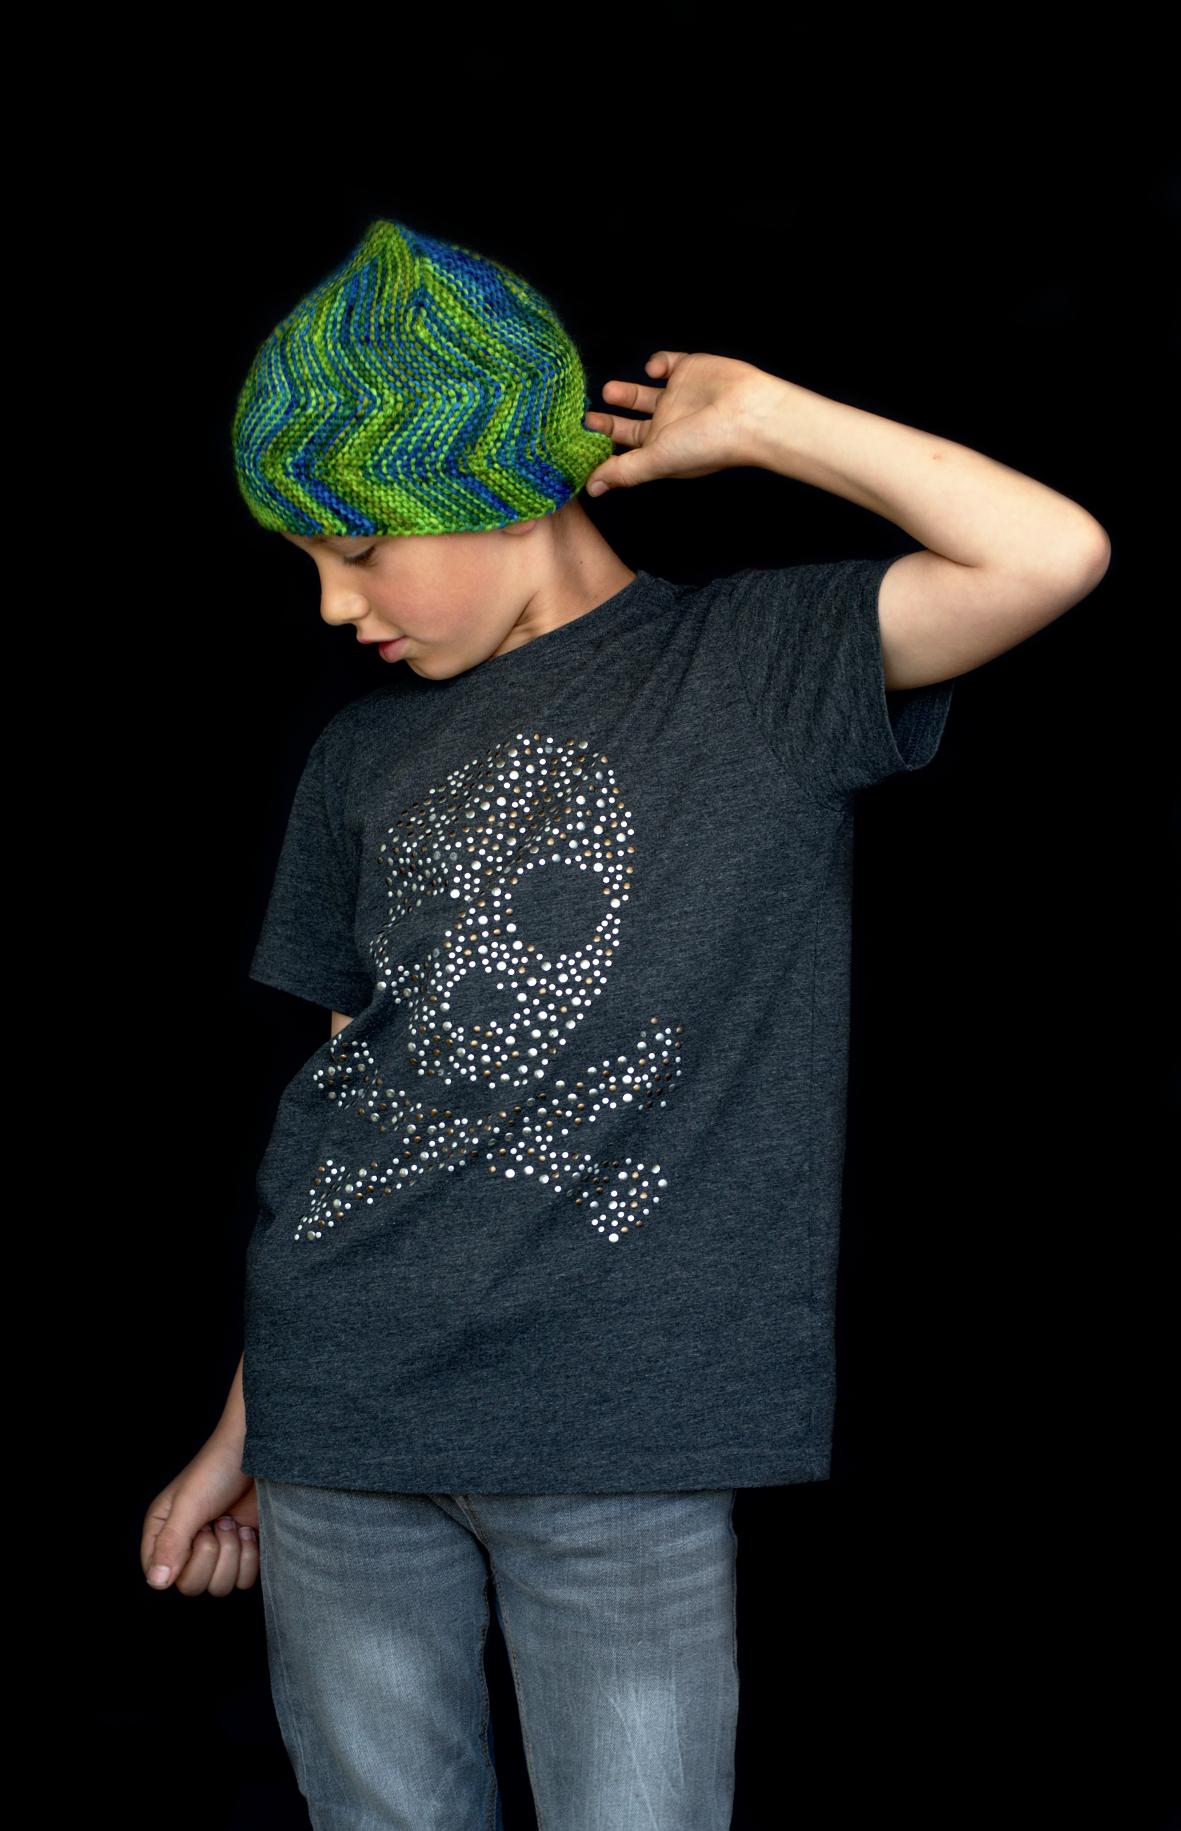 Mobberley sideways knit Hat hand knitting pattern